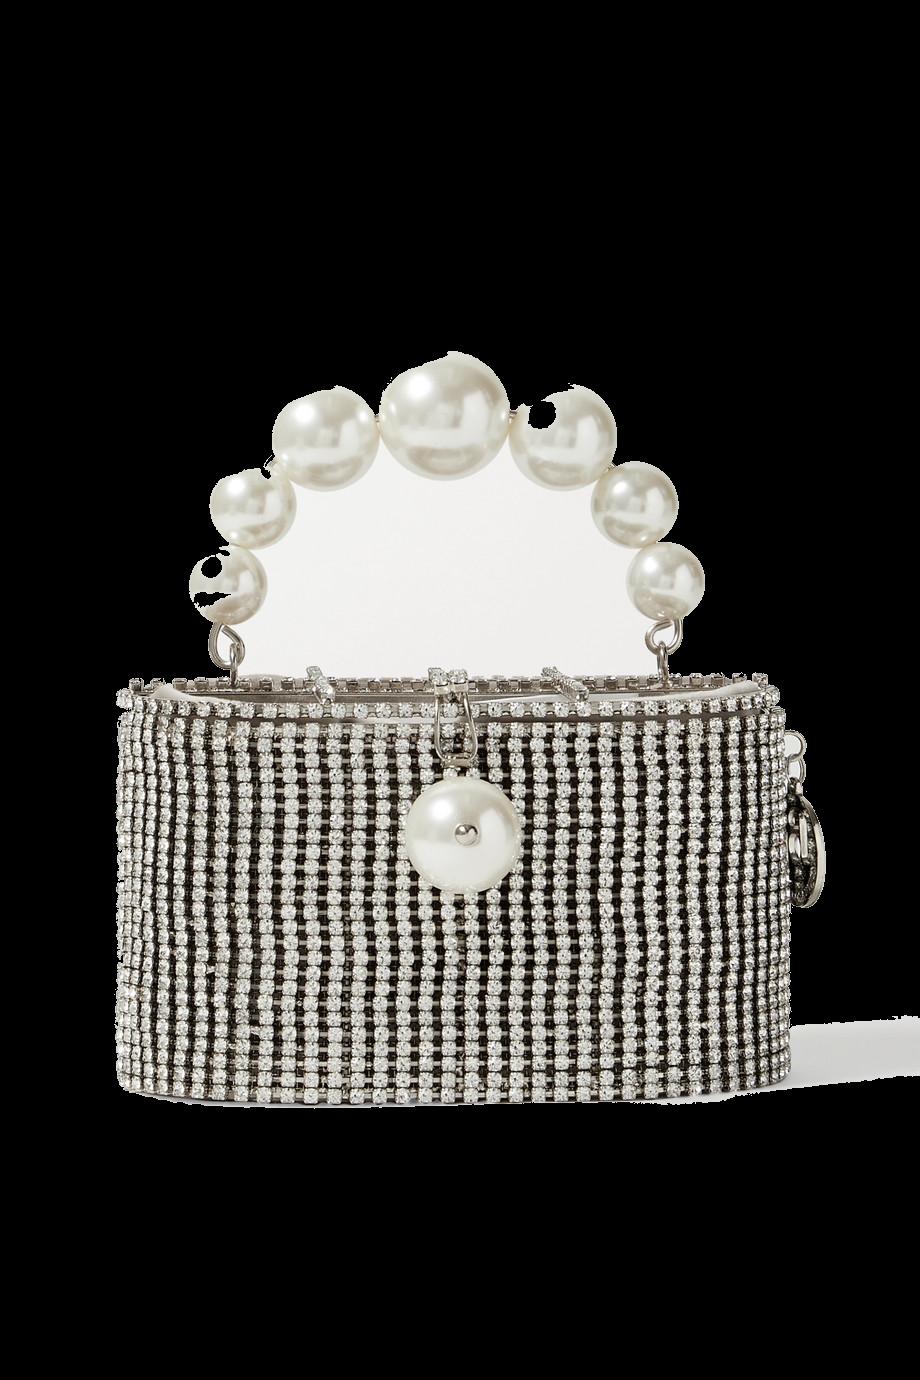 Super Holli embellished silver-tone tote